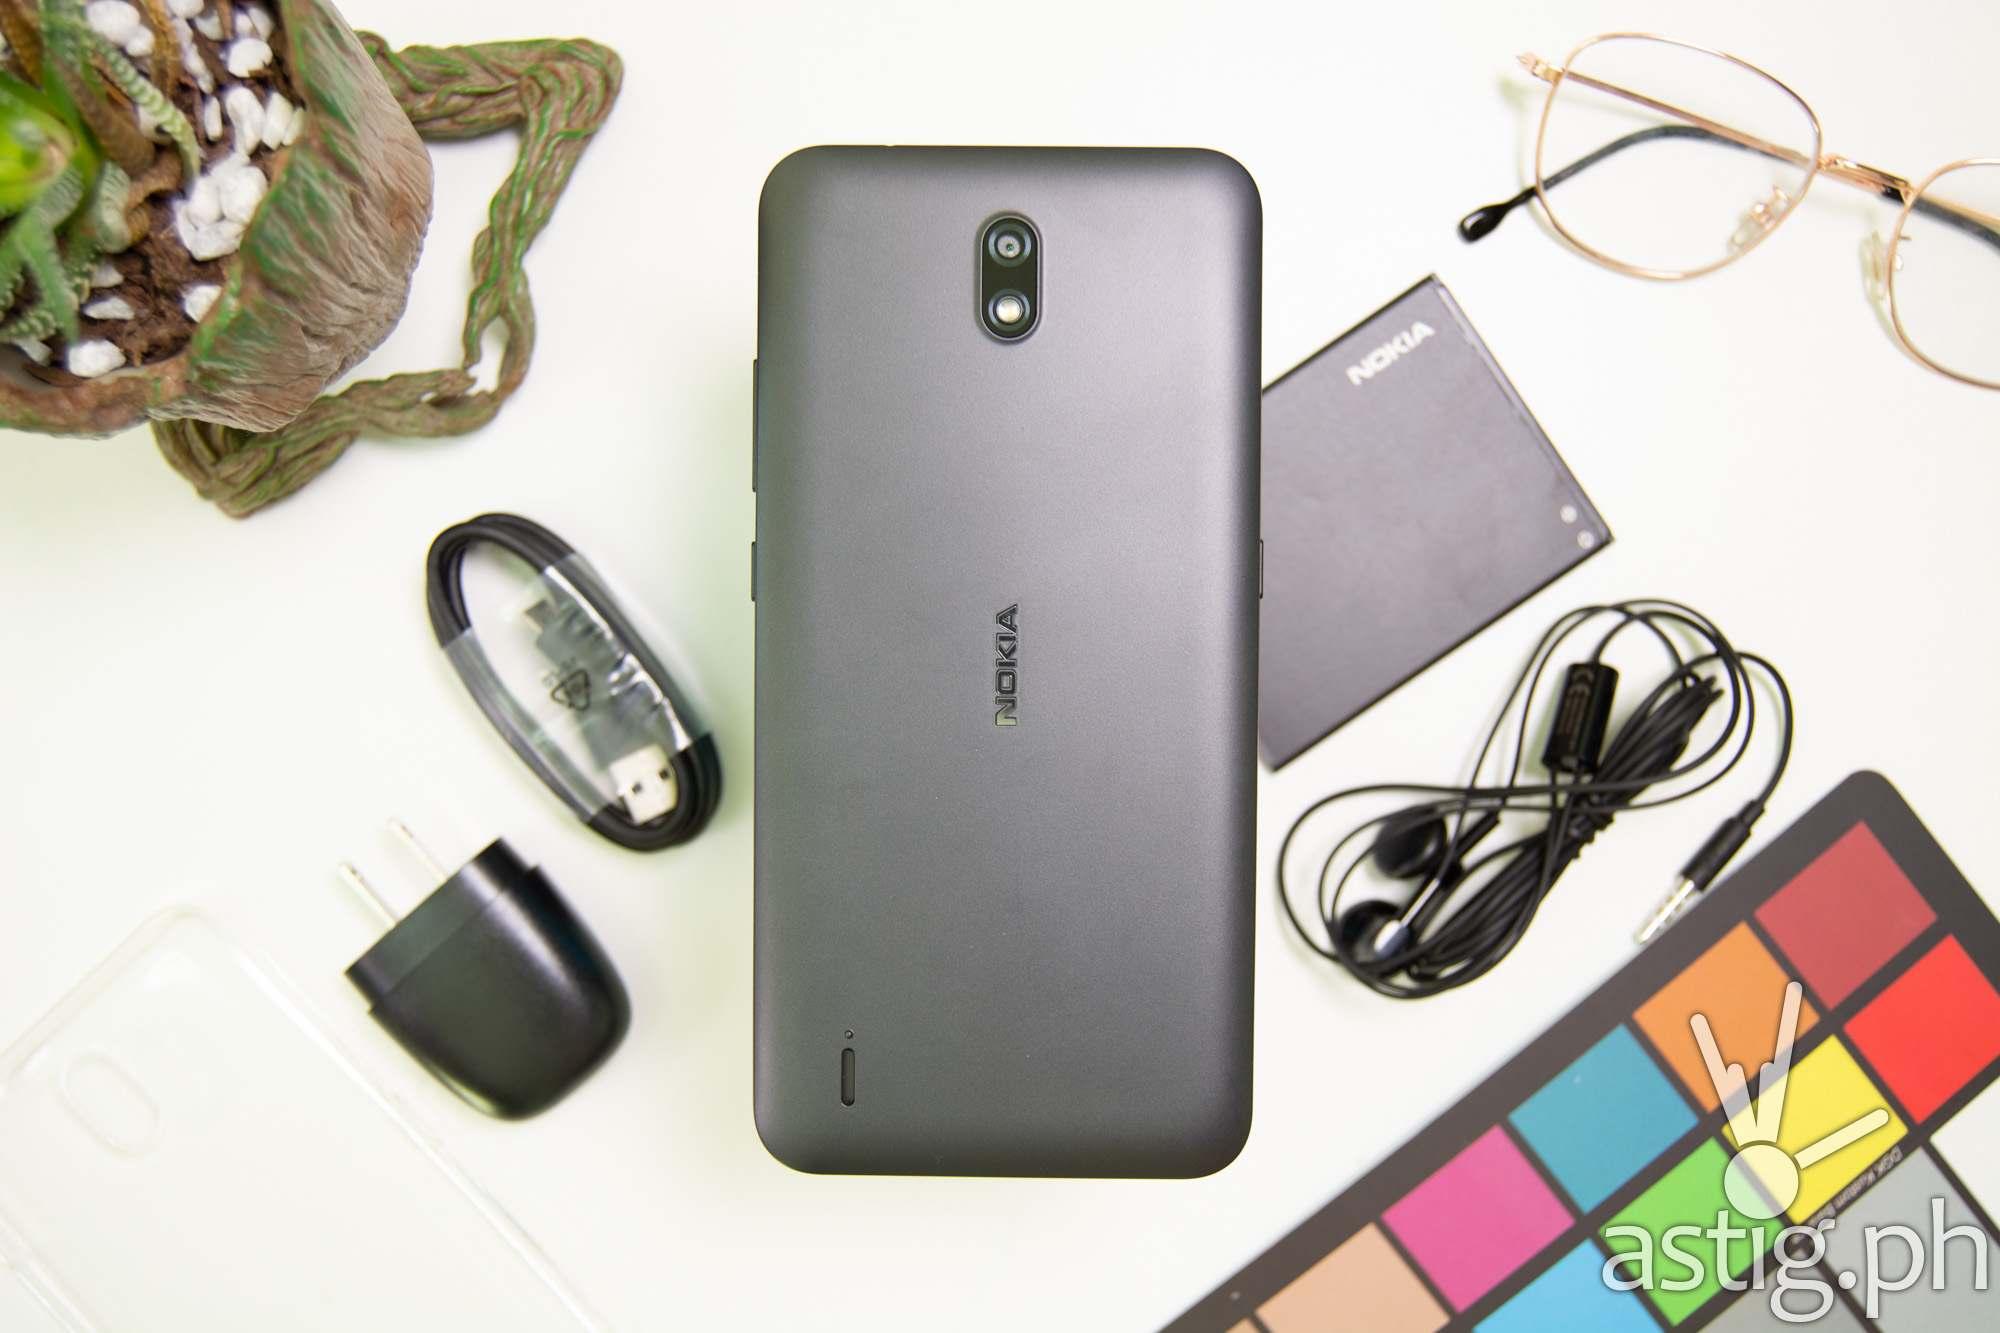 Unboxing battery flatlay back - Nokia C2 (Philippines)